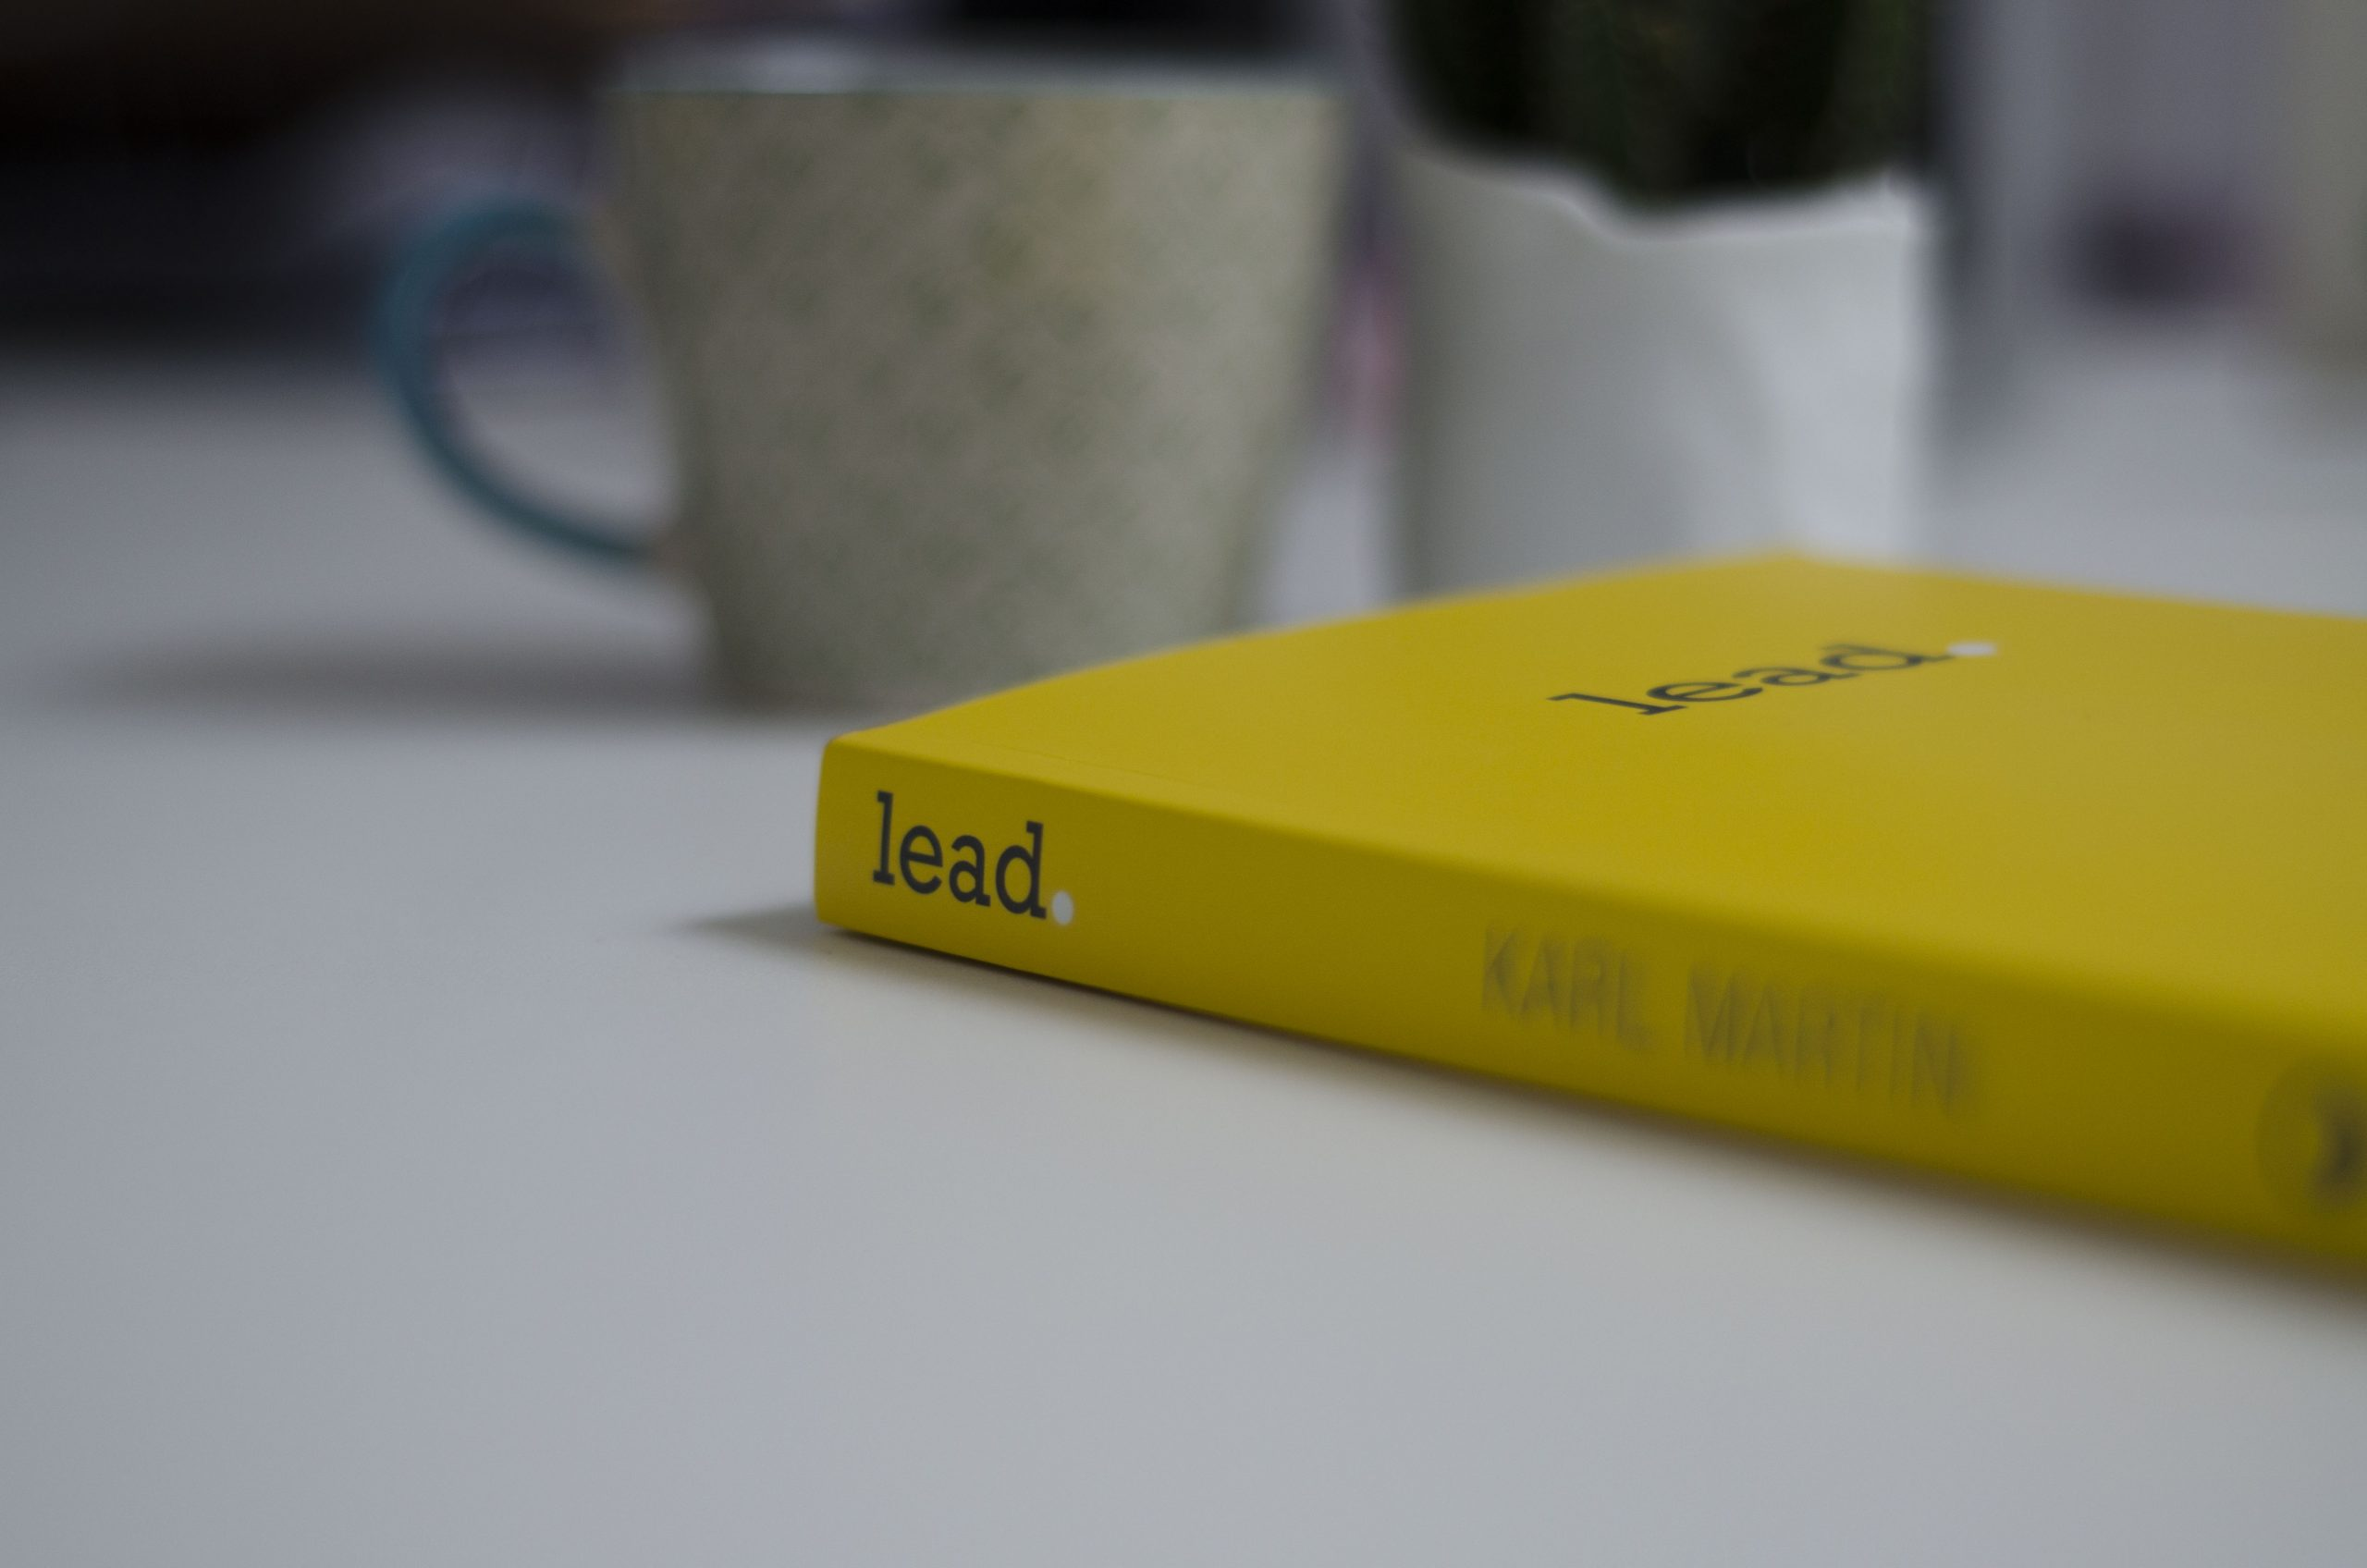 Lead by Karl Martin